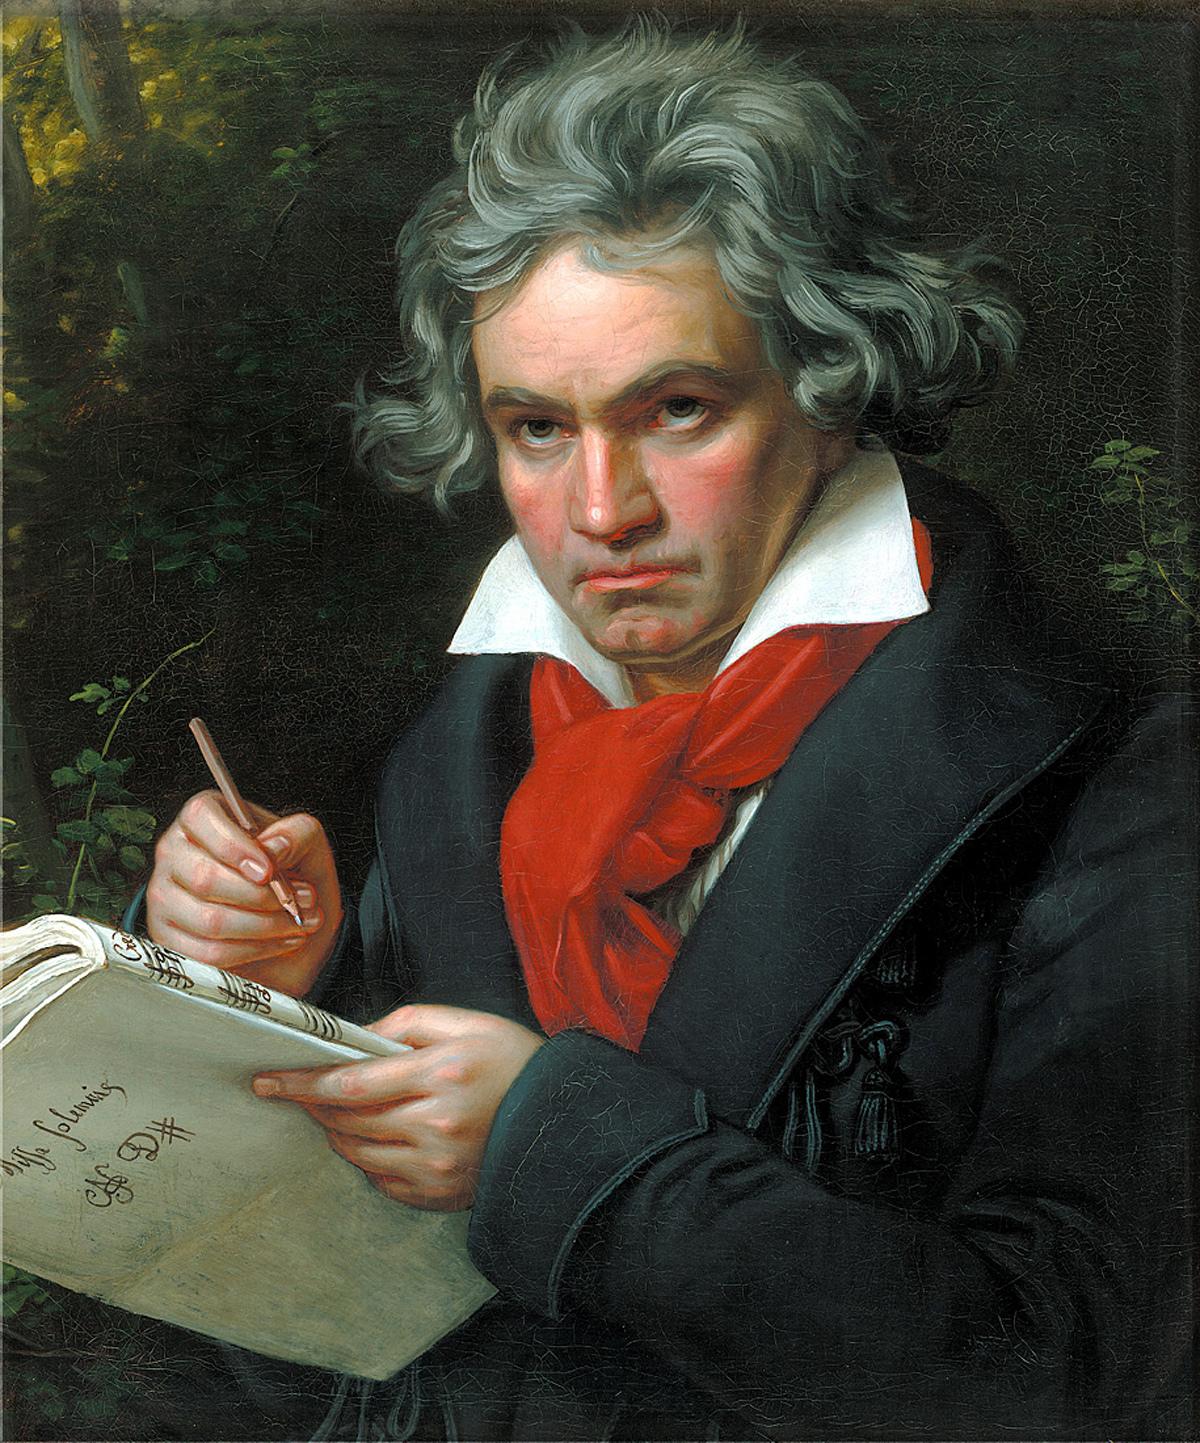 /personal/tassopoulou_m_e-arsakeio_gr/Documents/Παρουσίαση-1821/images/25-3/Beethoven.jpg